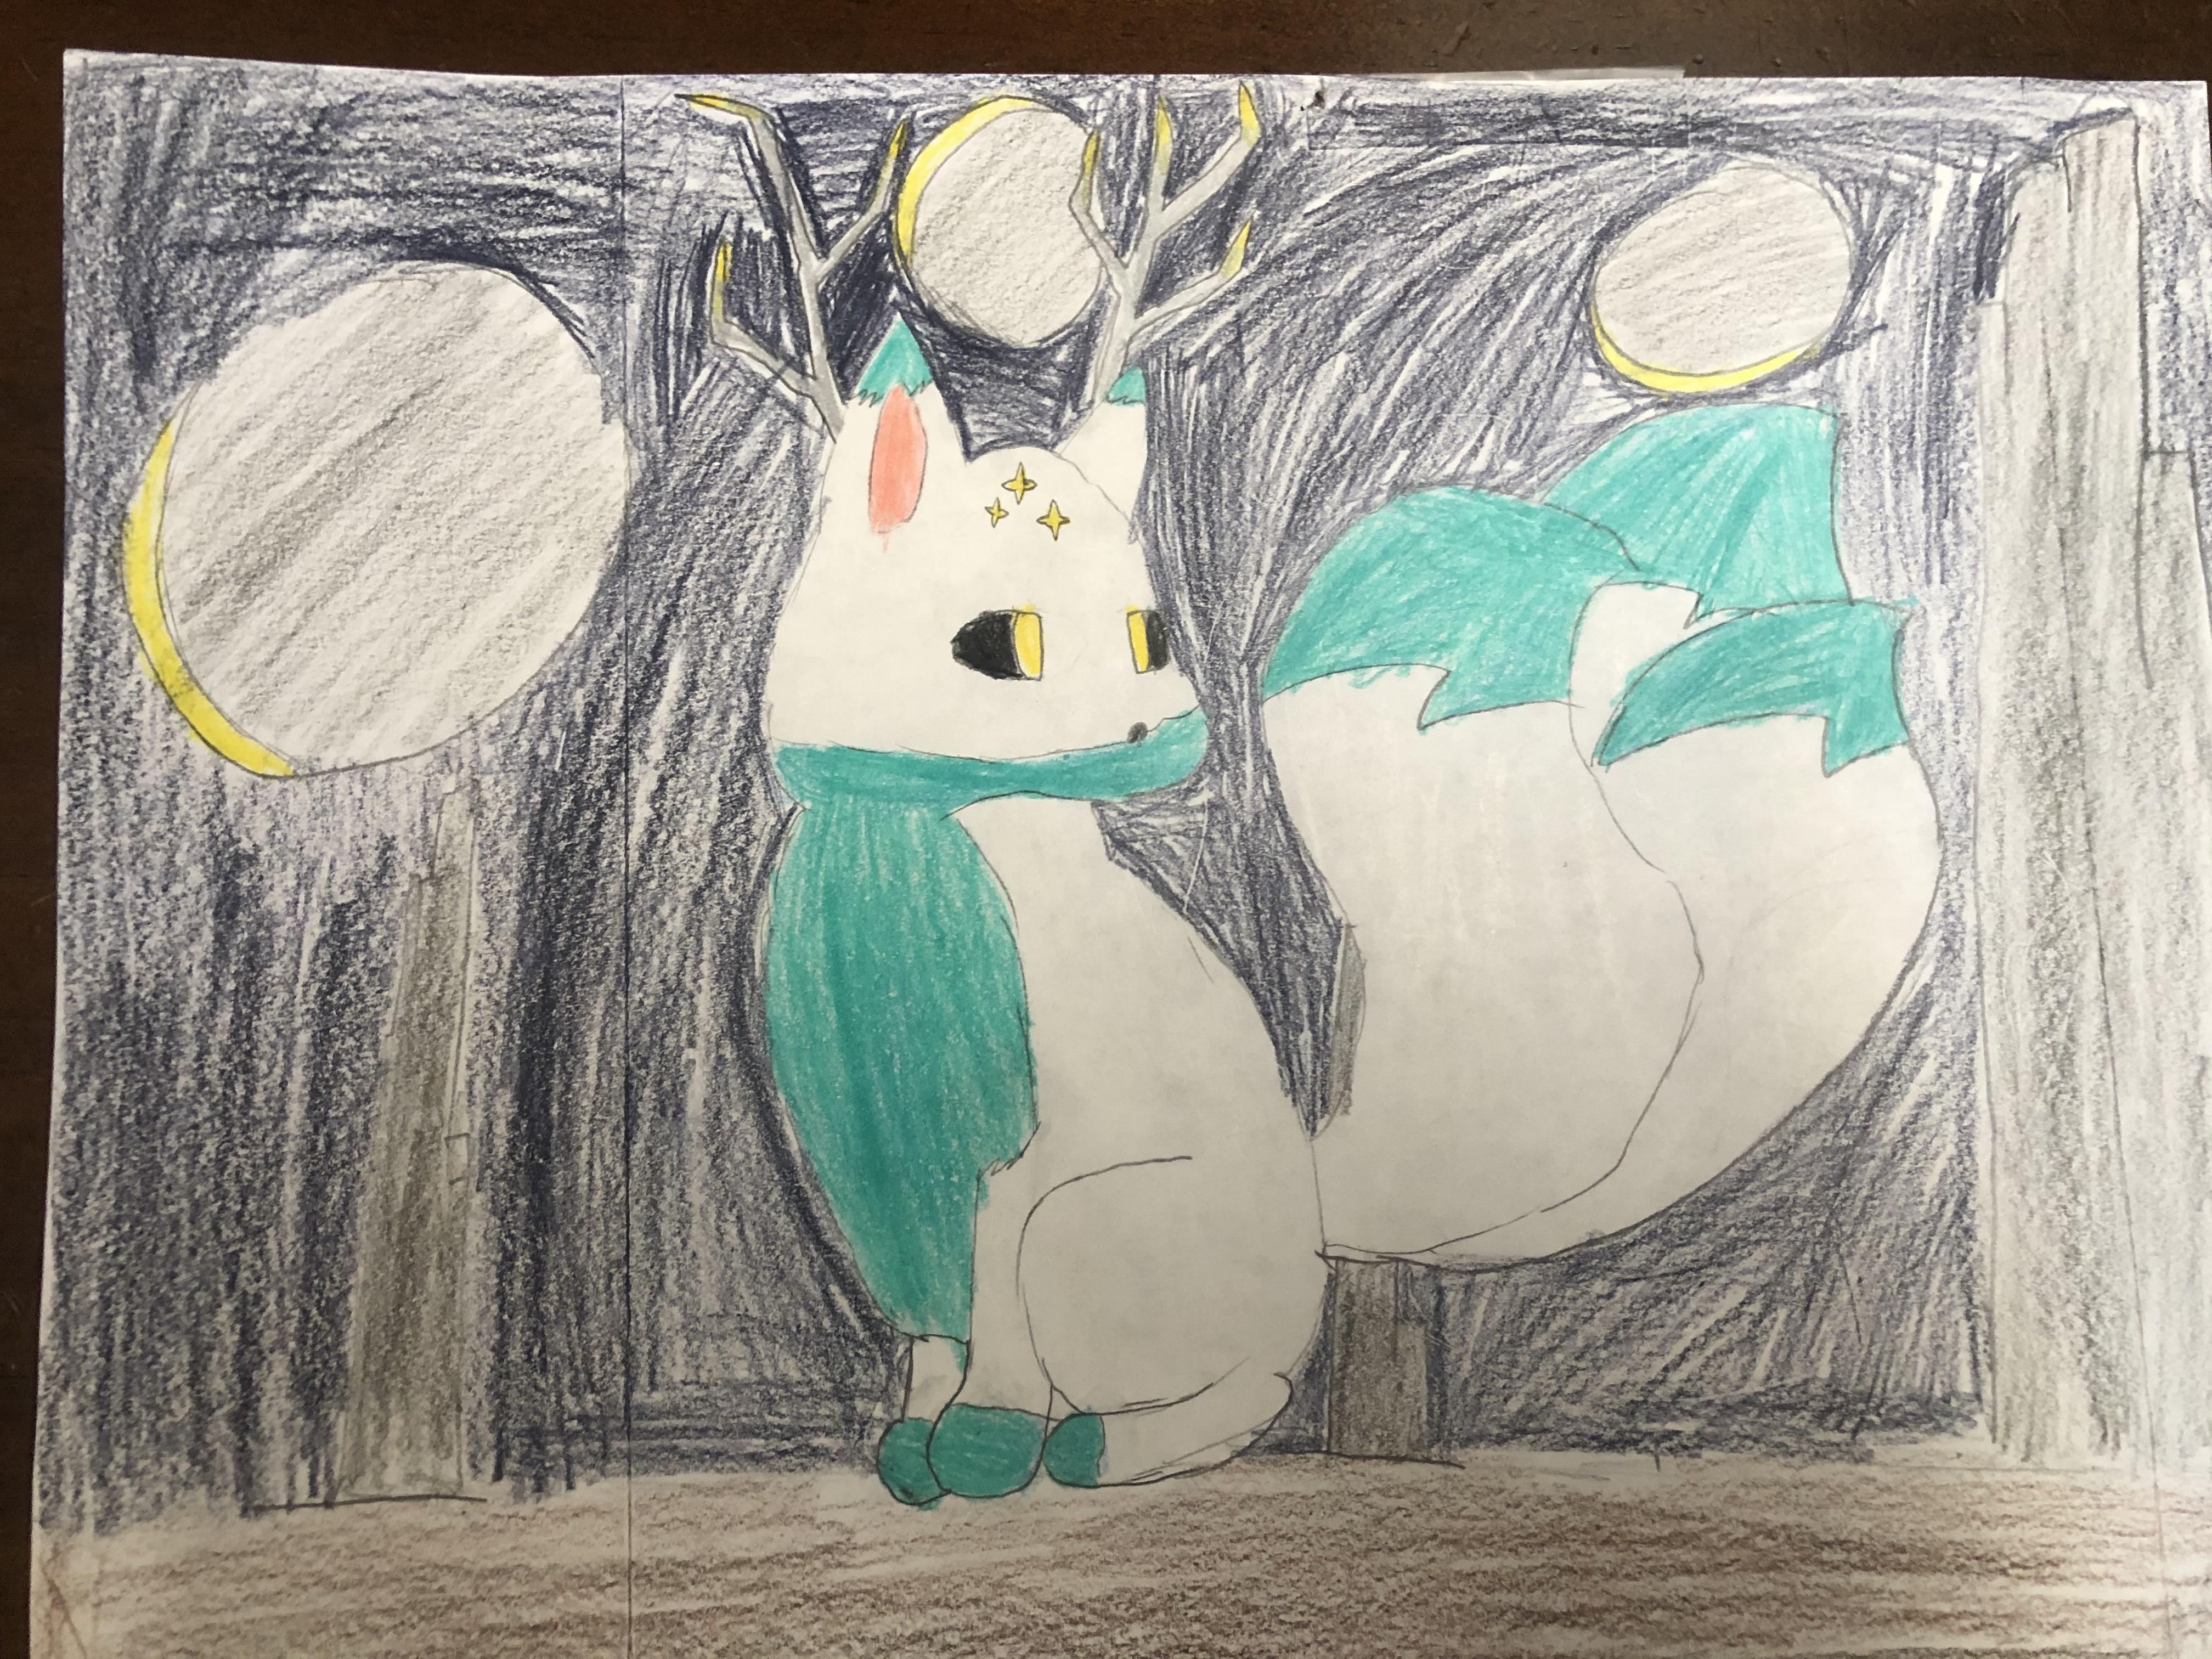 Cosmic Kitsune by Sarah Leal